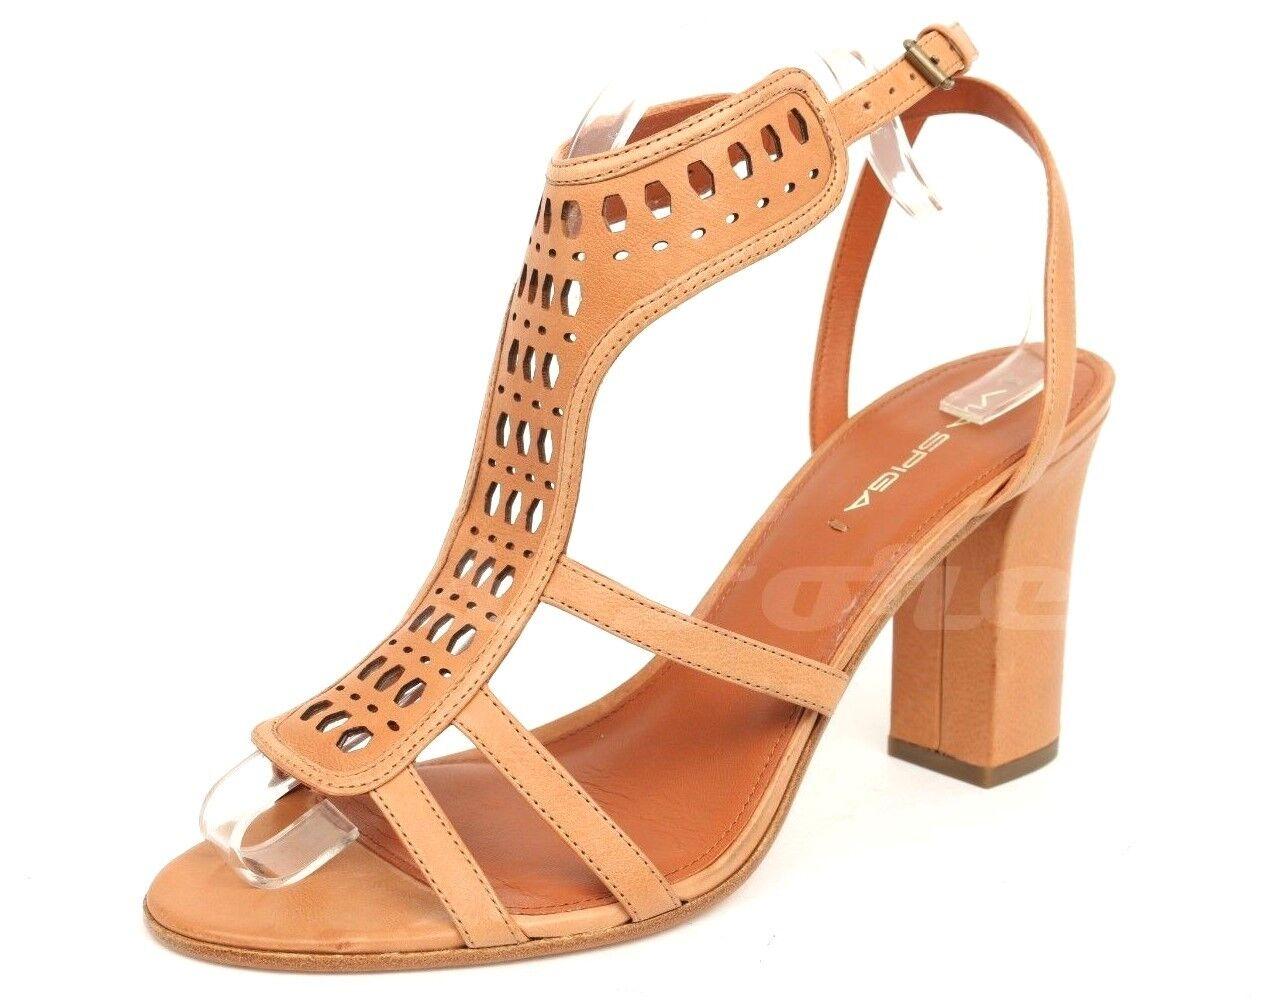 Damenschuhe VIA SPIGA Tan Braun Leder Ankle Strap Sandales Sz. 10 M